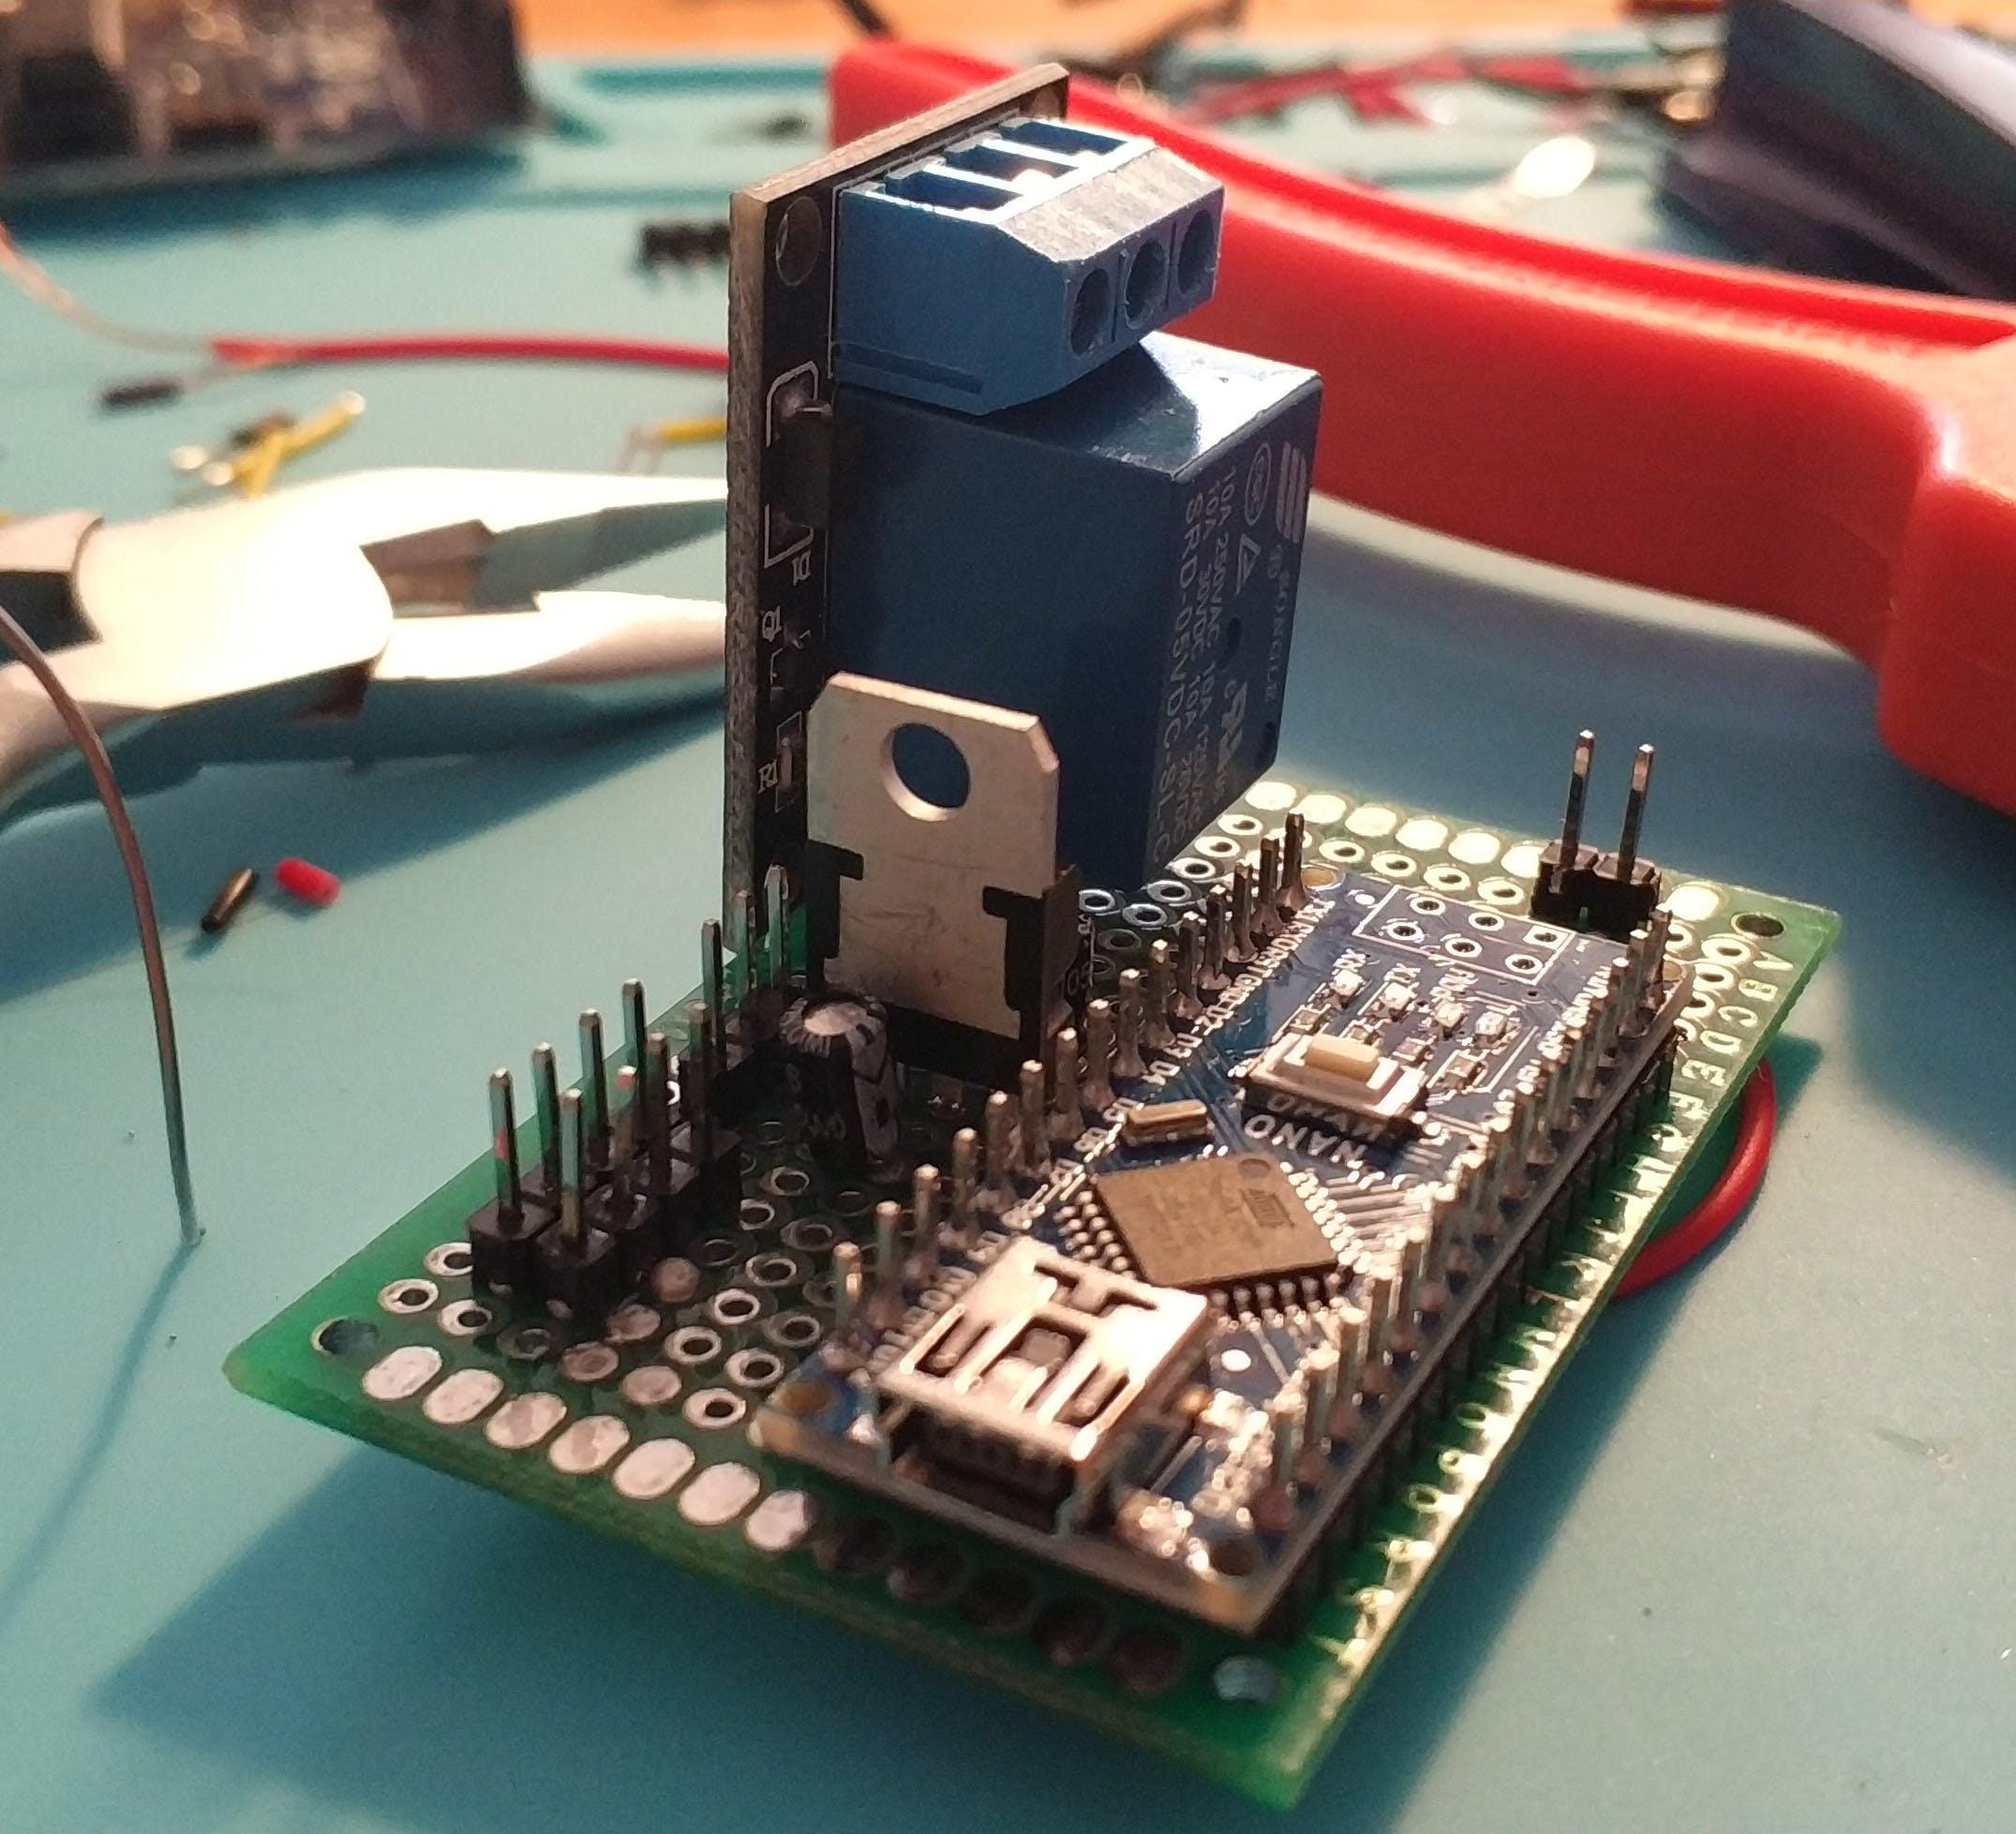 7805 Voltage regulator with Capacitors.